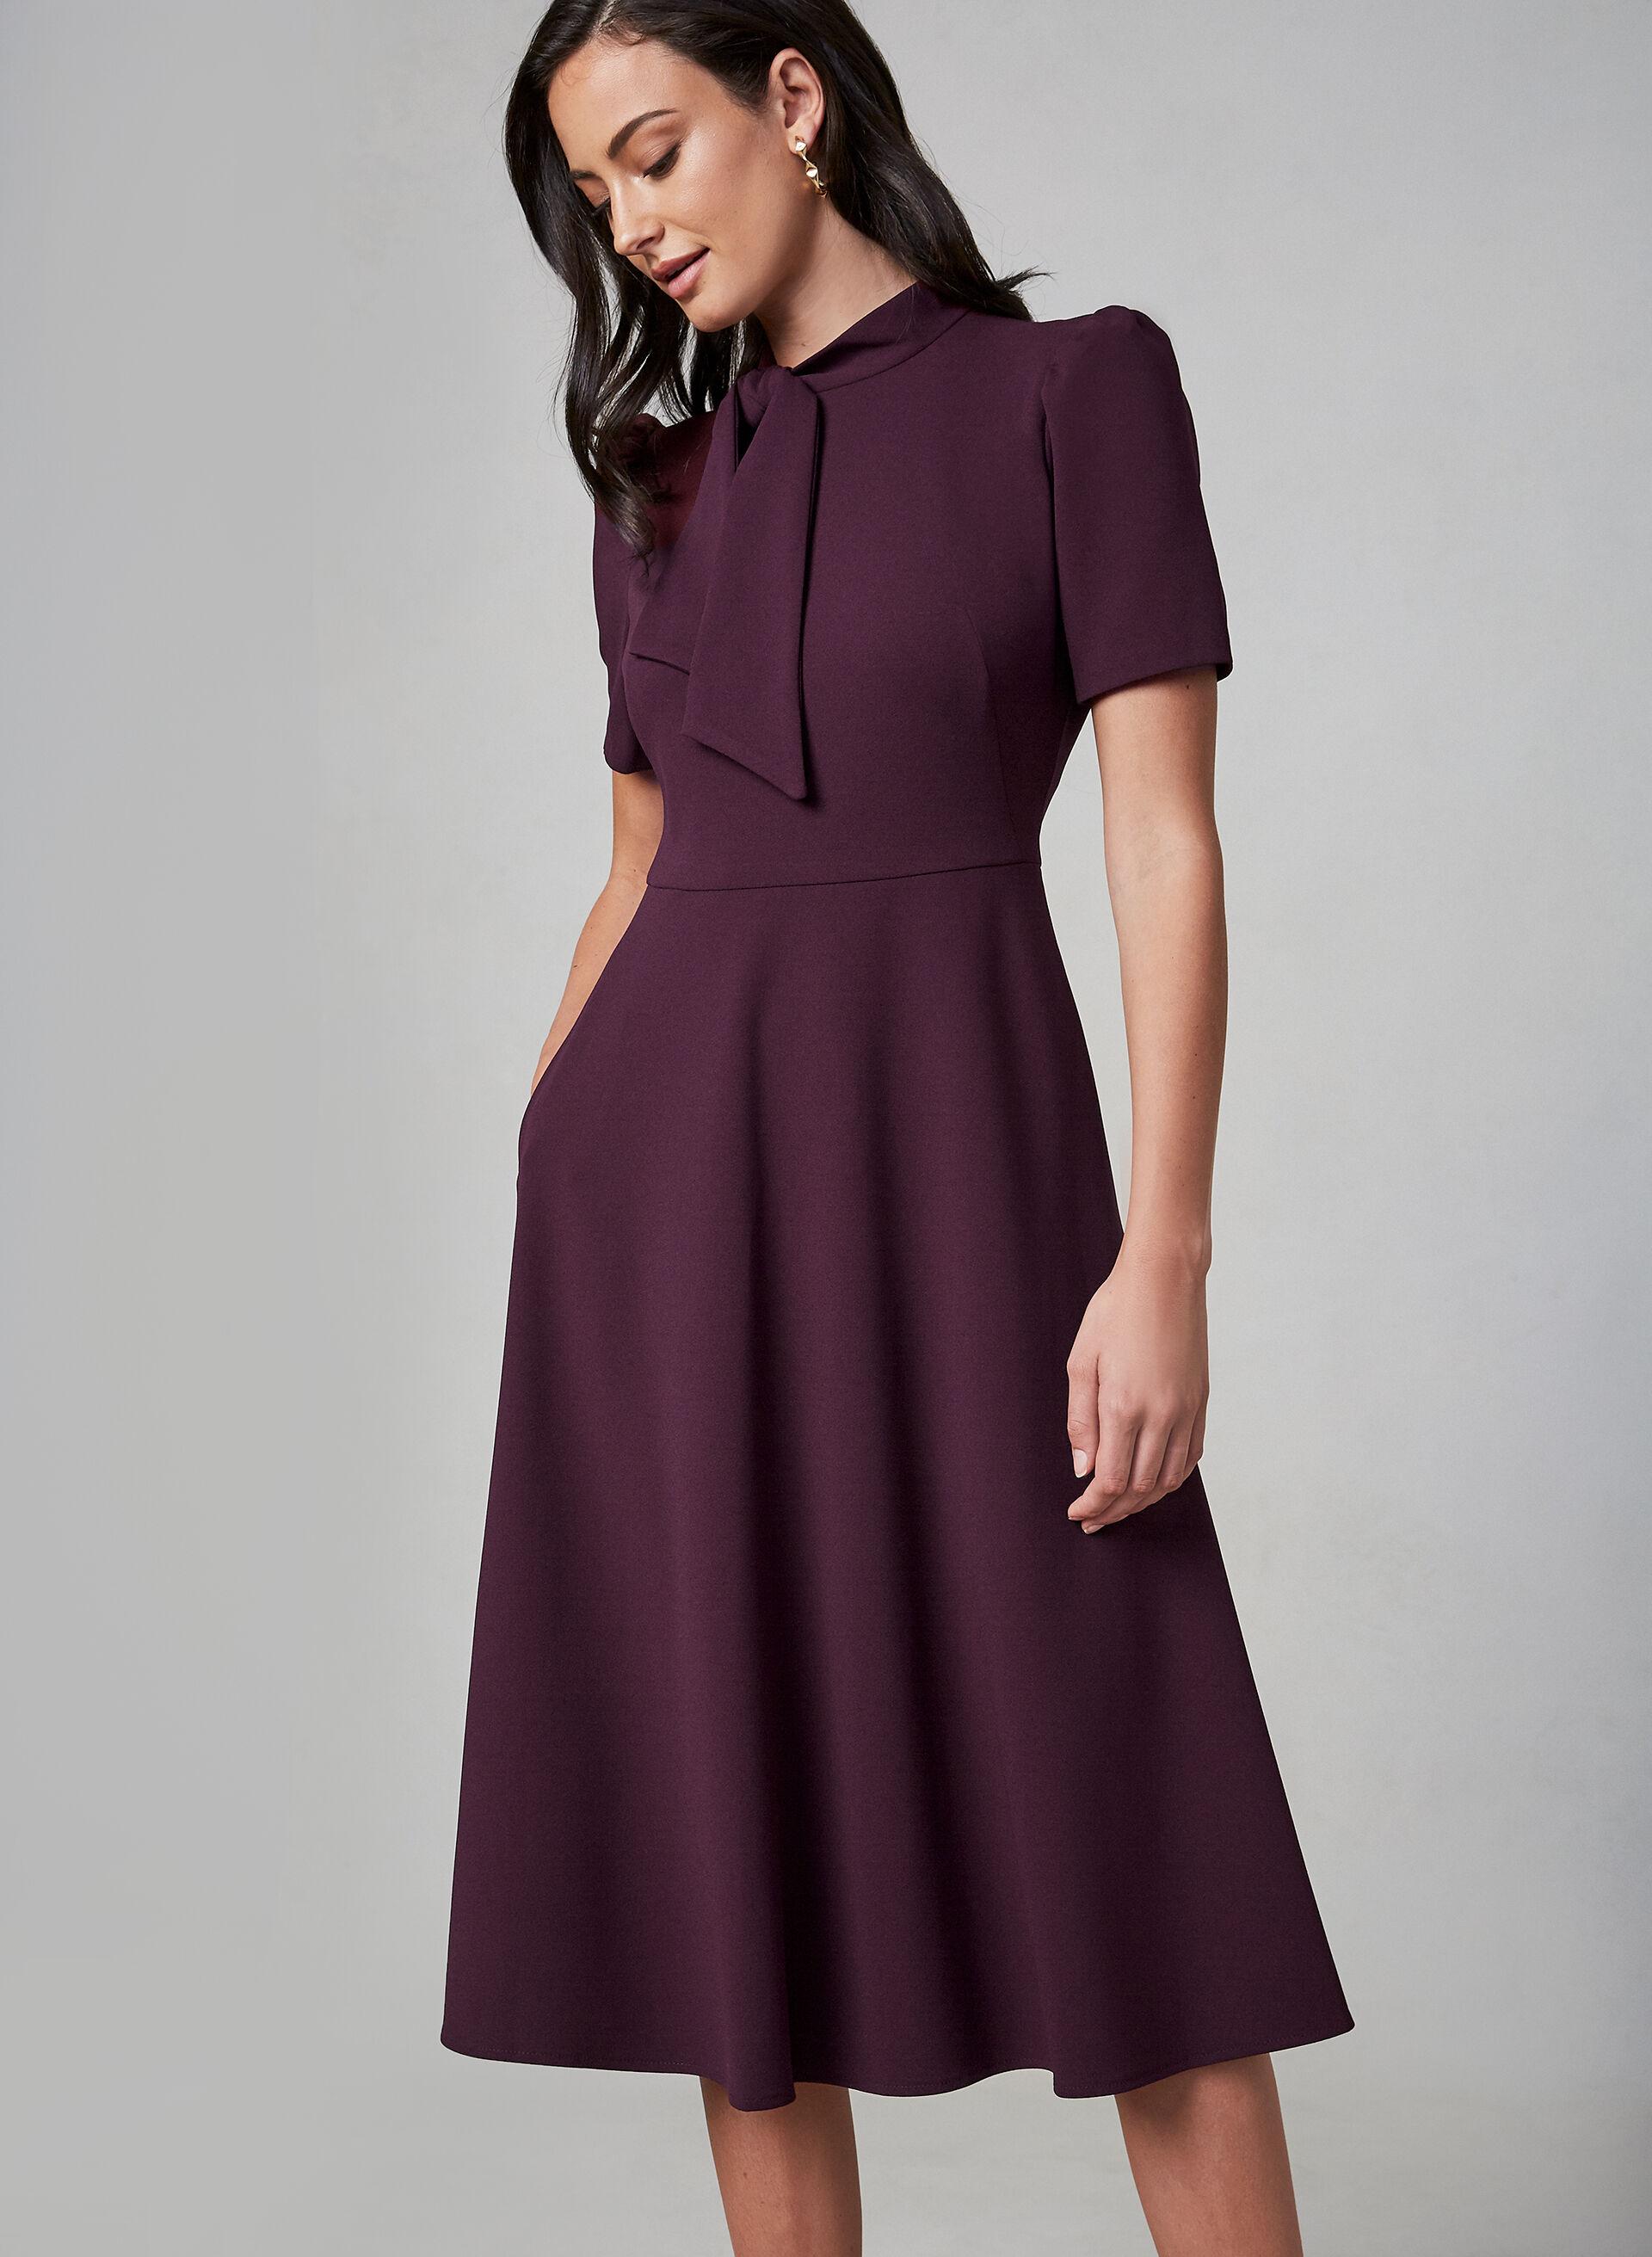 For WomenEveningPromamp; Melanie Dresses Lyne Day N0Omnv8w